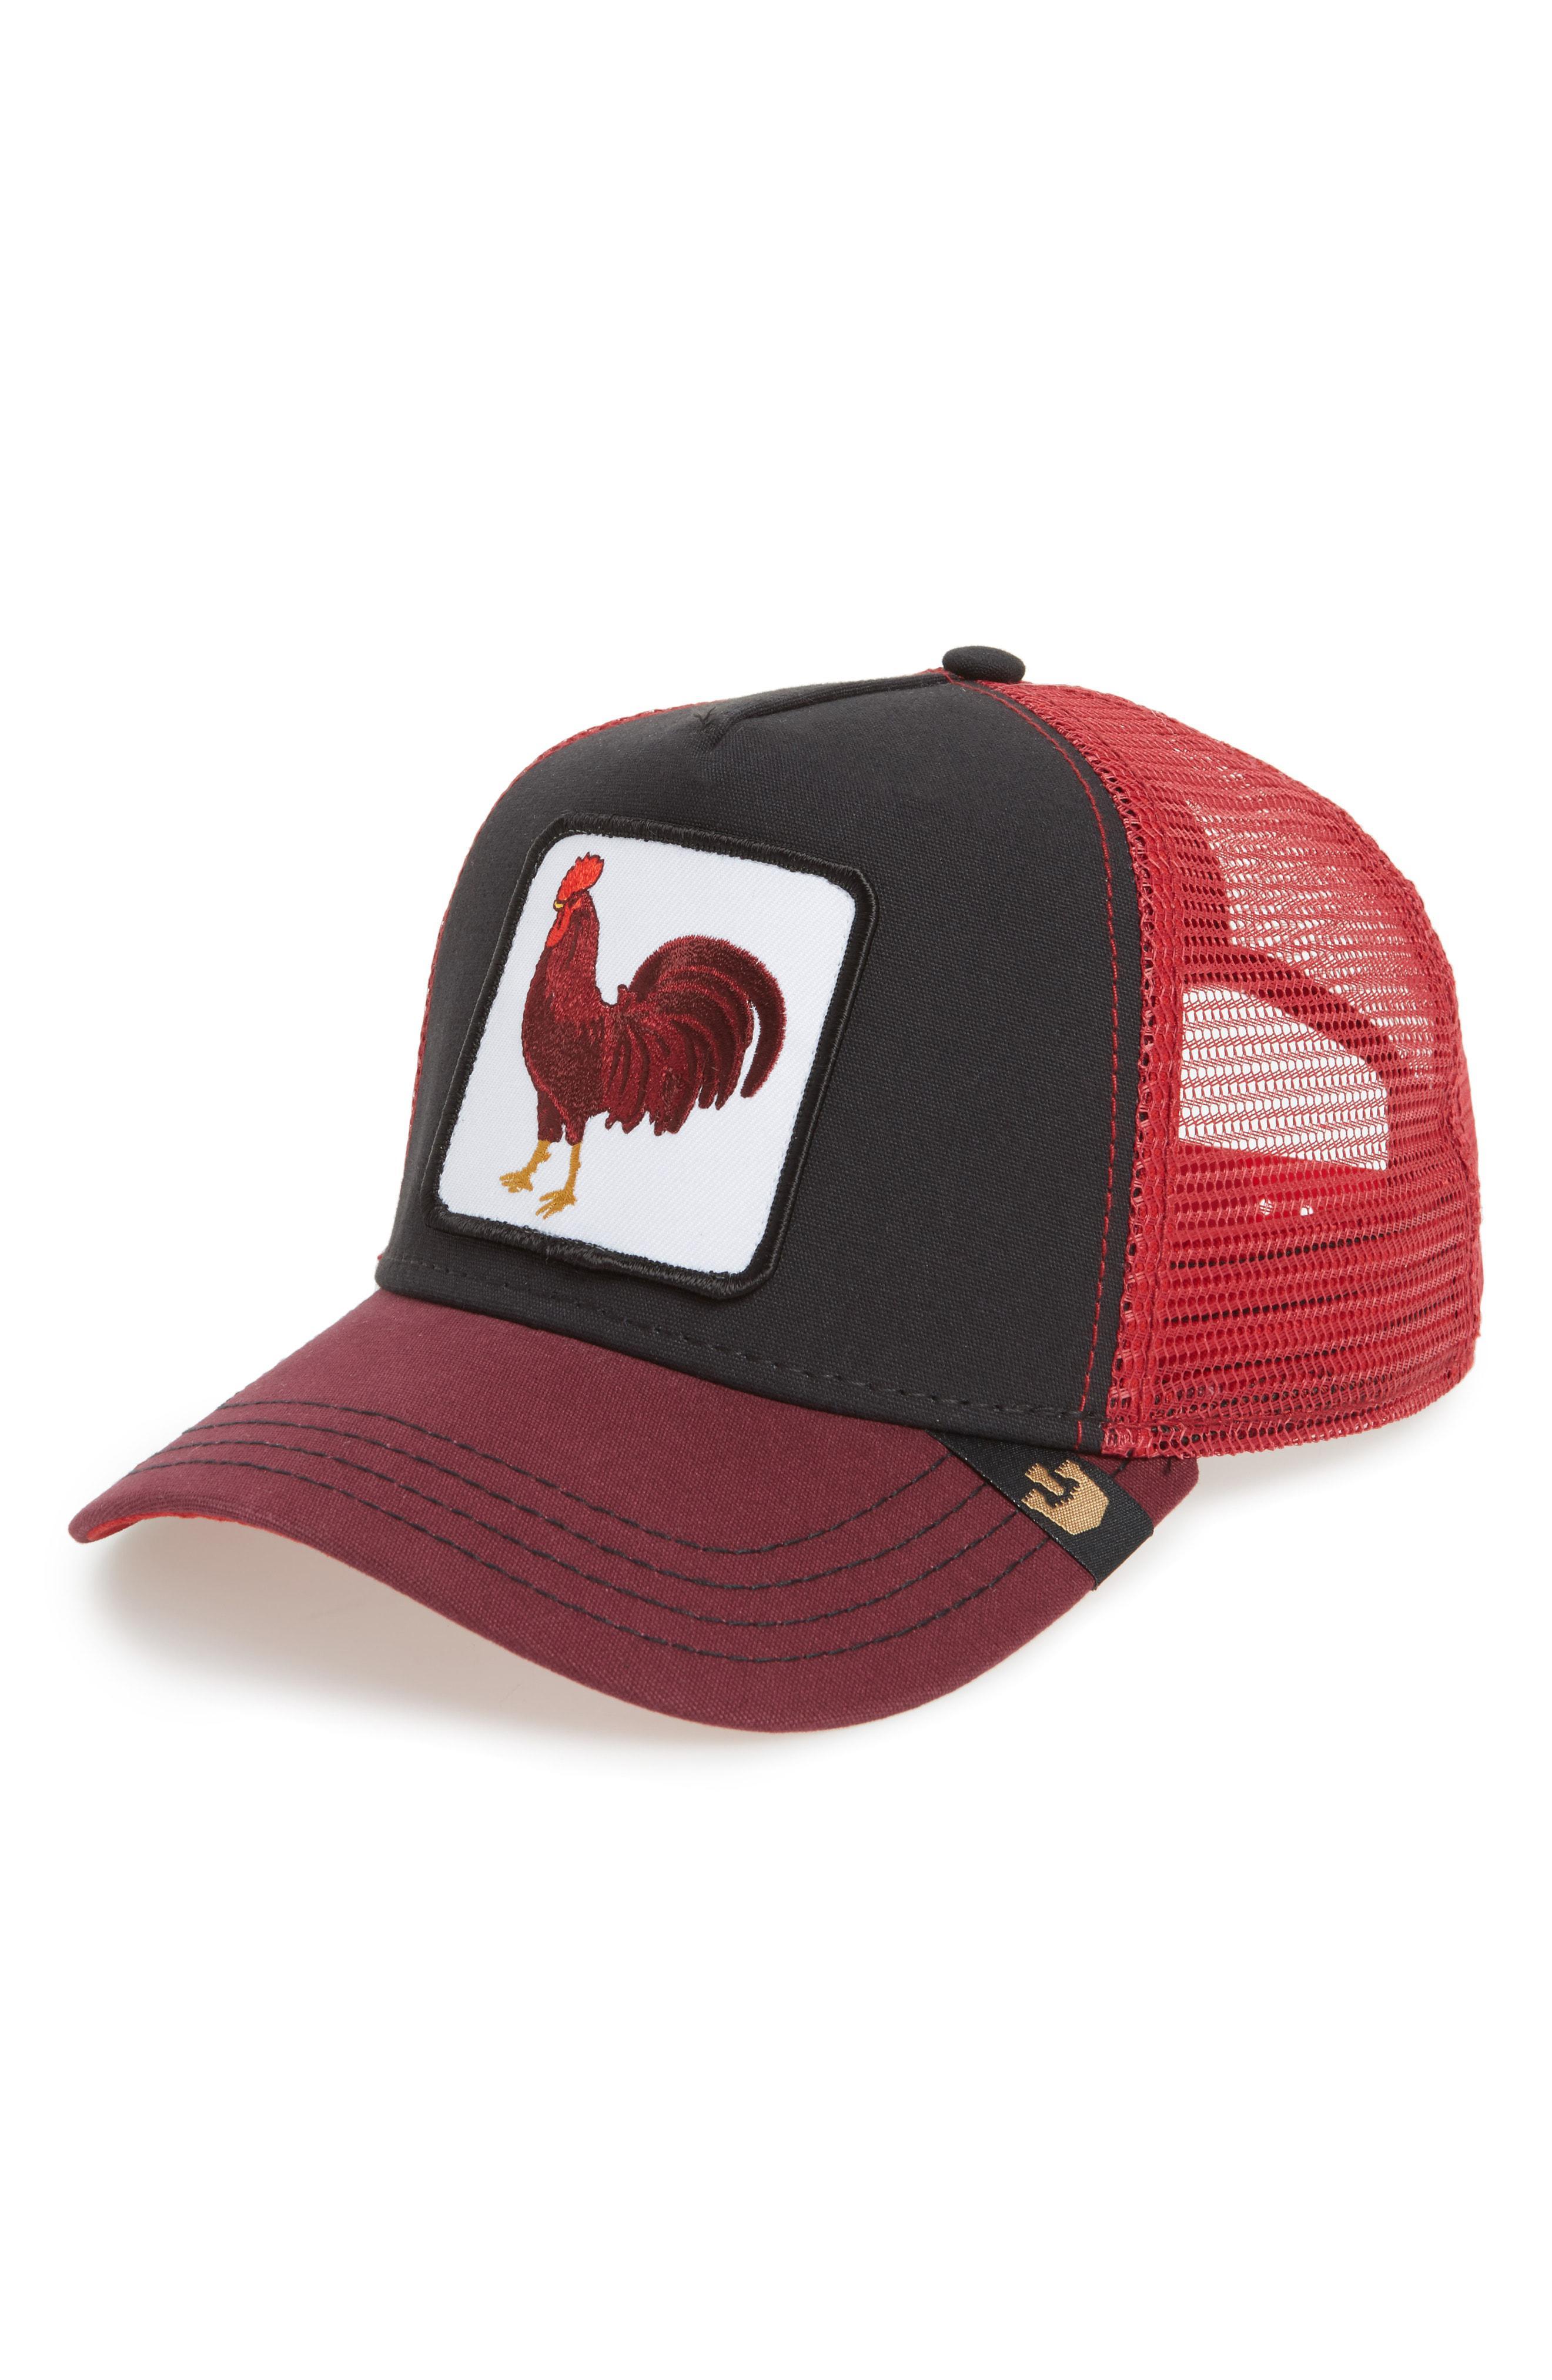 Goorin Bros Barnyard King Trucker Hat in Black for Men - Lyst 10d7f04ad6f2